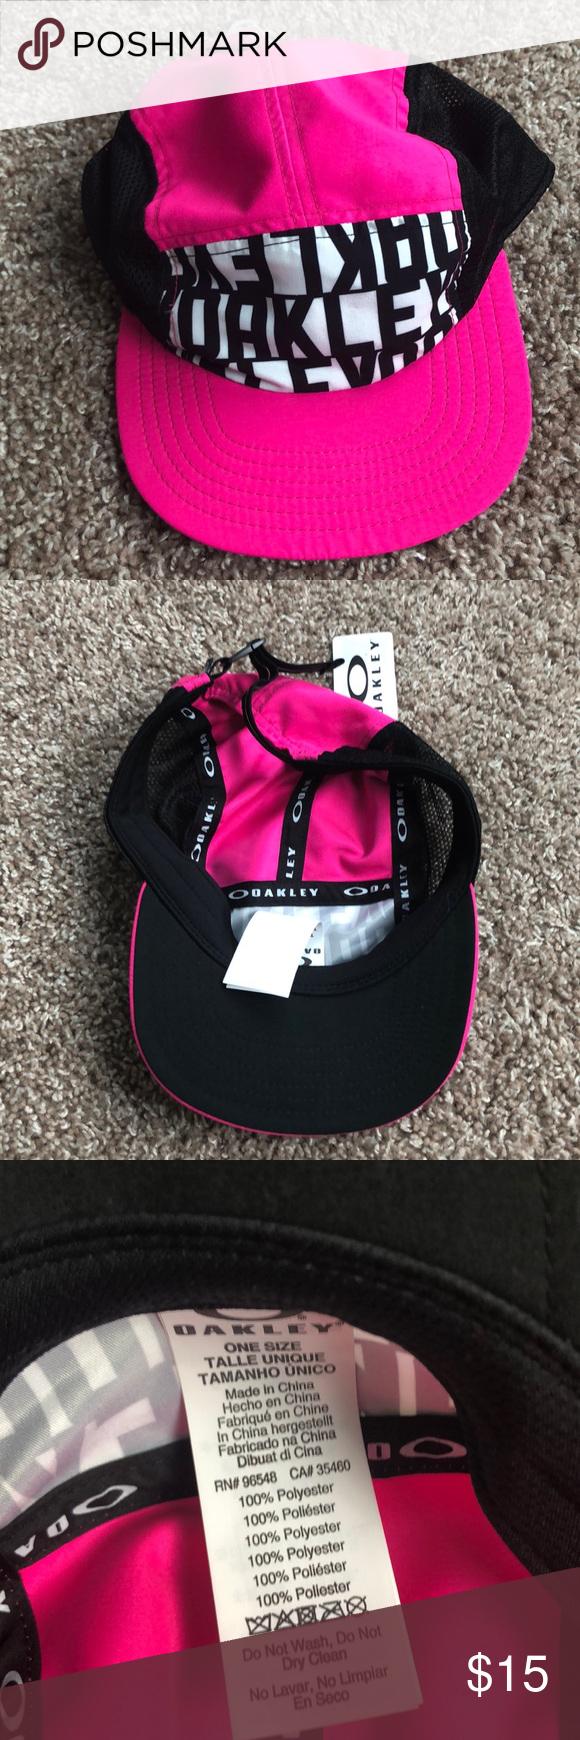 Faded Denim Oneill SUVA Trucker Hat